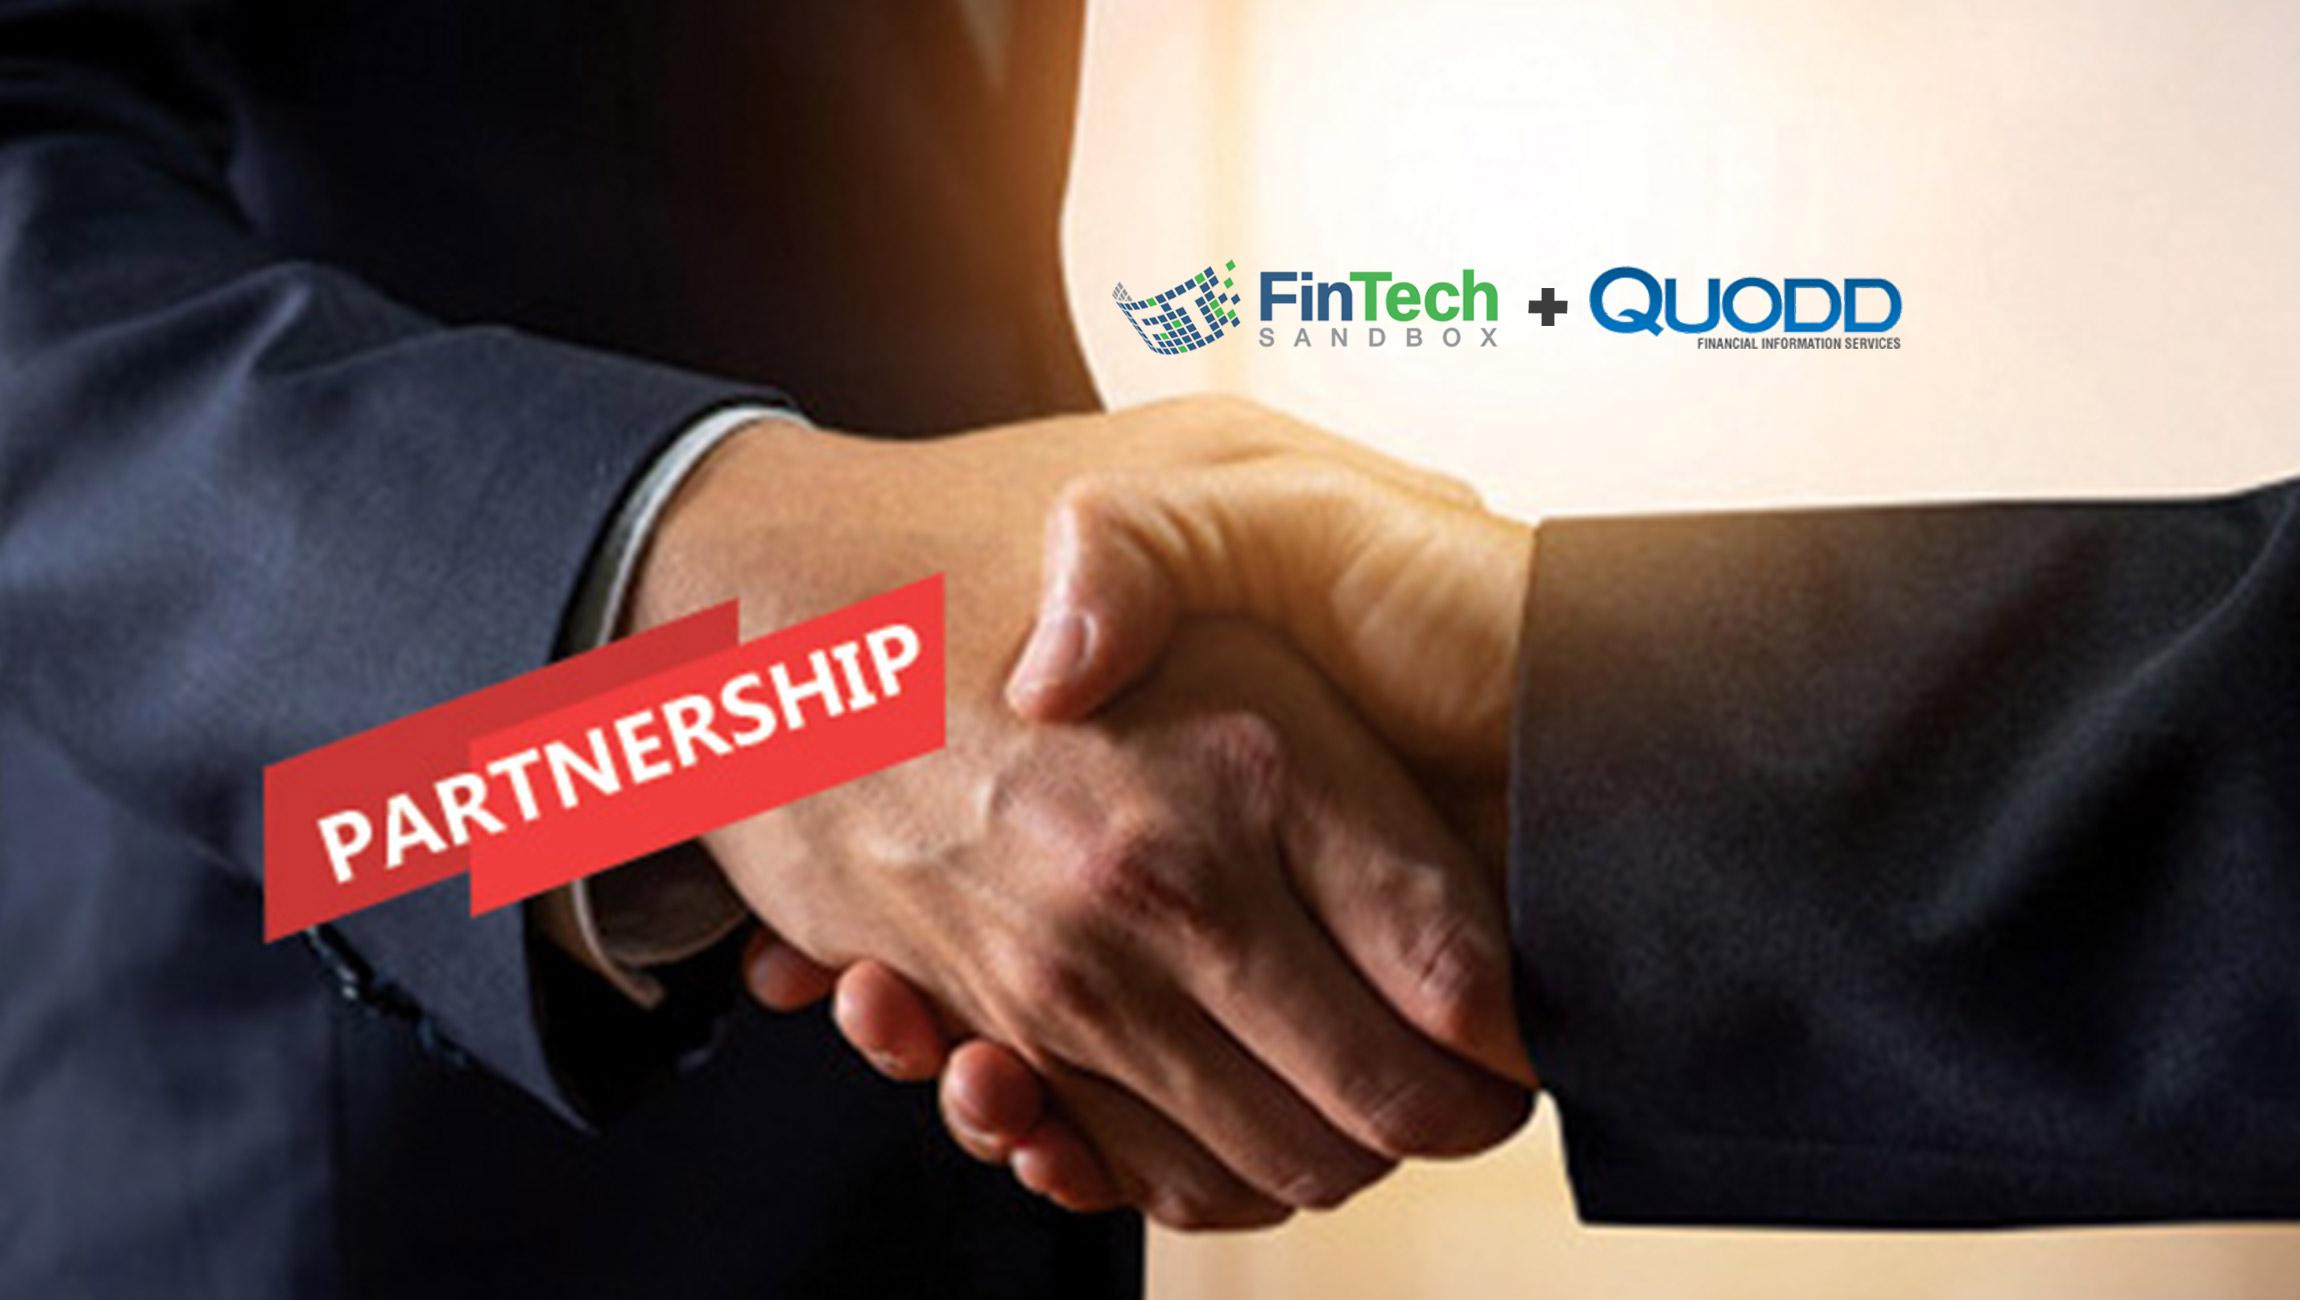 QUODD Financial Information Services Joins FinTech Sandbox as Data Partner, Making Market Data Available through Flexible Technology to FinTech Startups